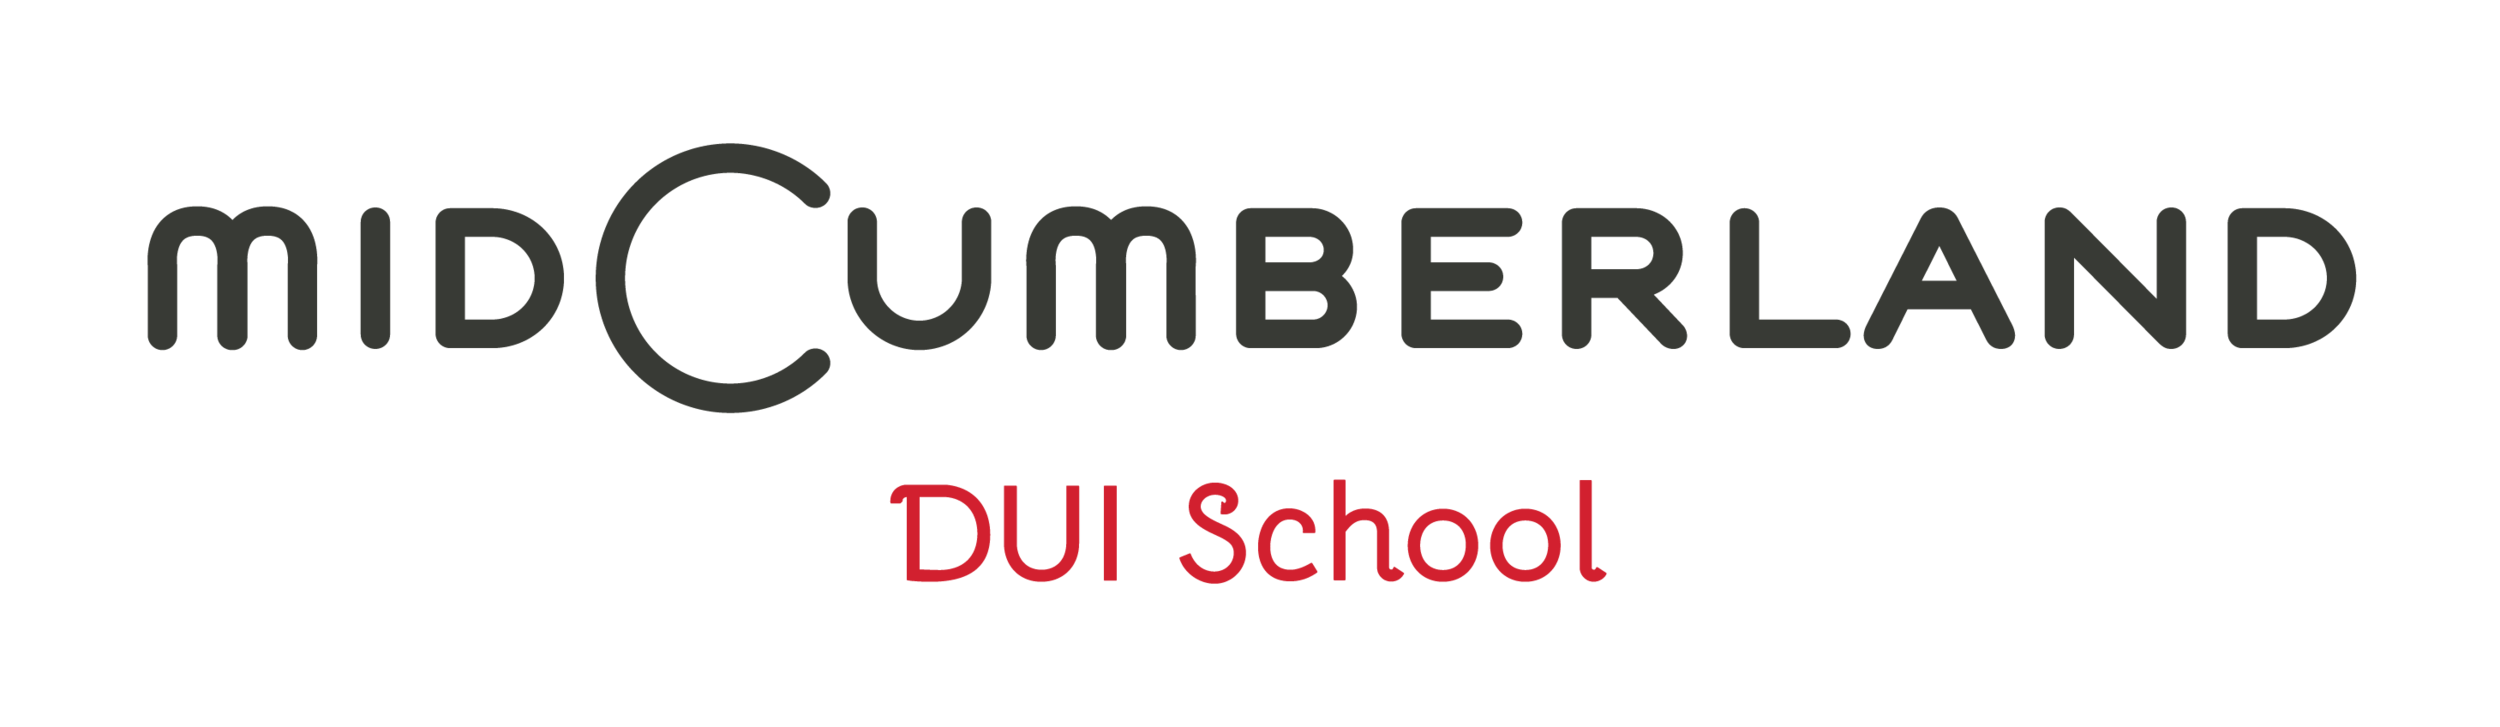 midcumberland-dui-school-logo-web.png